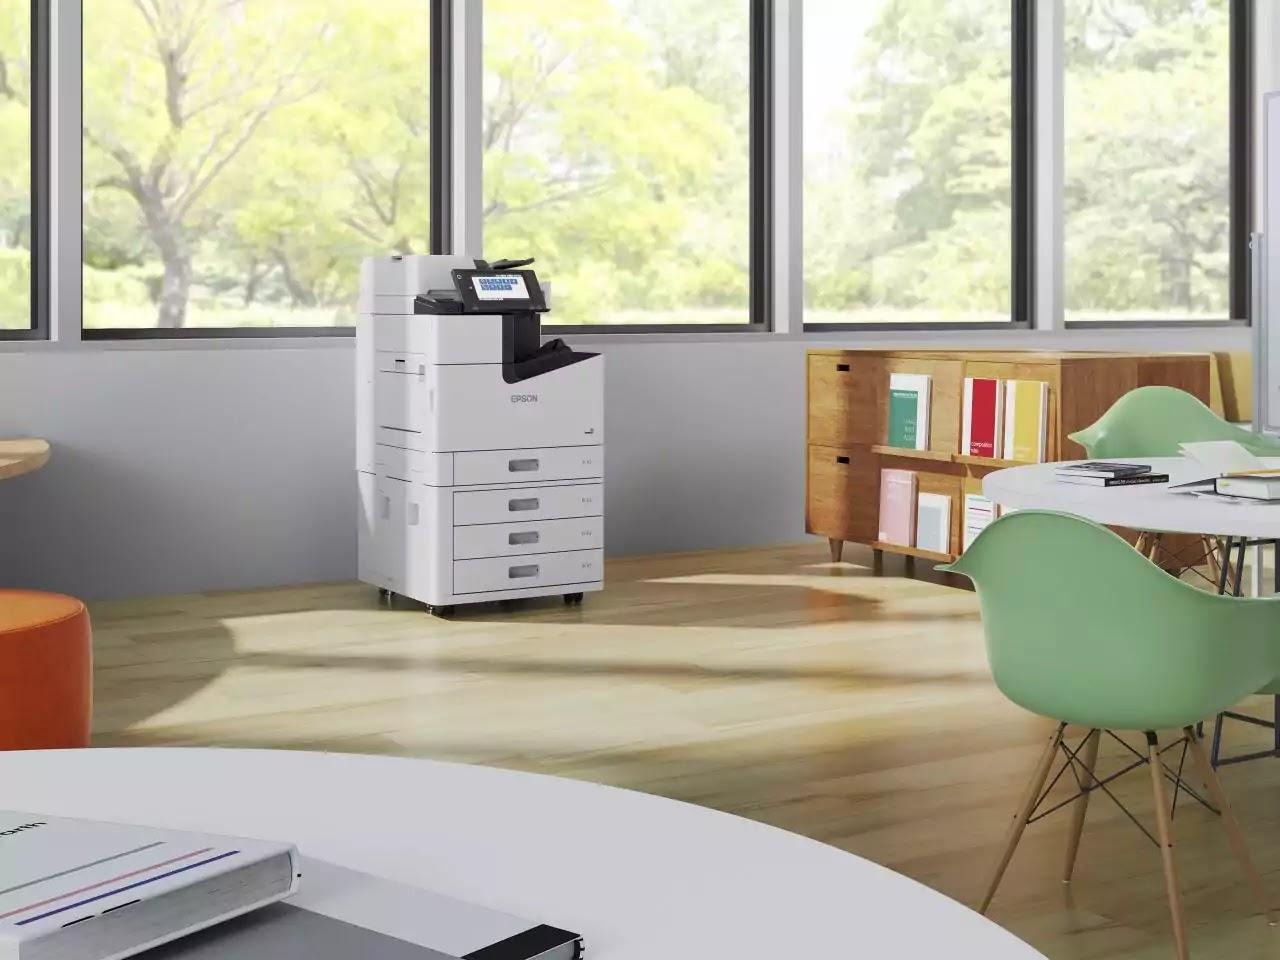 Epson WorkForce Enterprise Printers